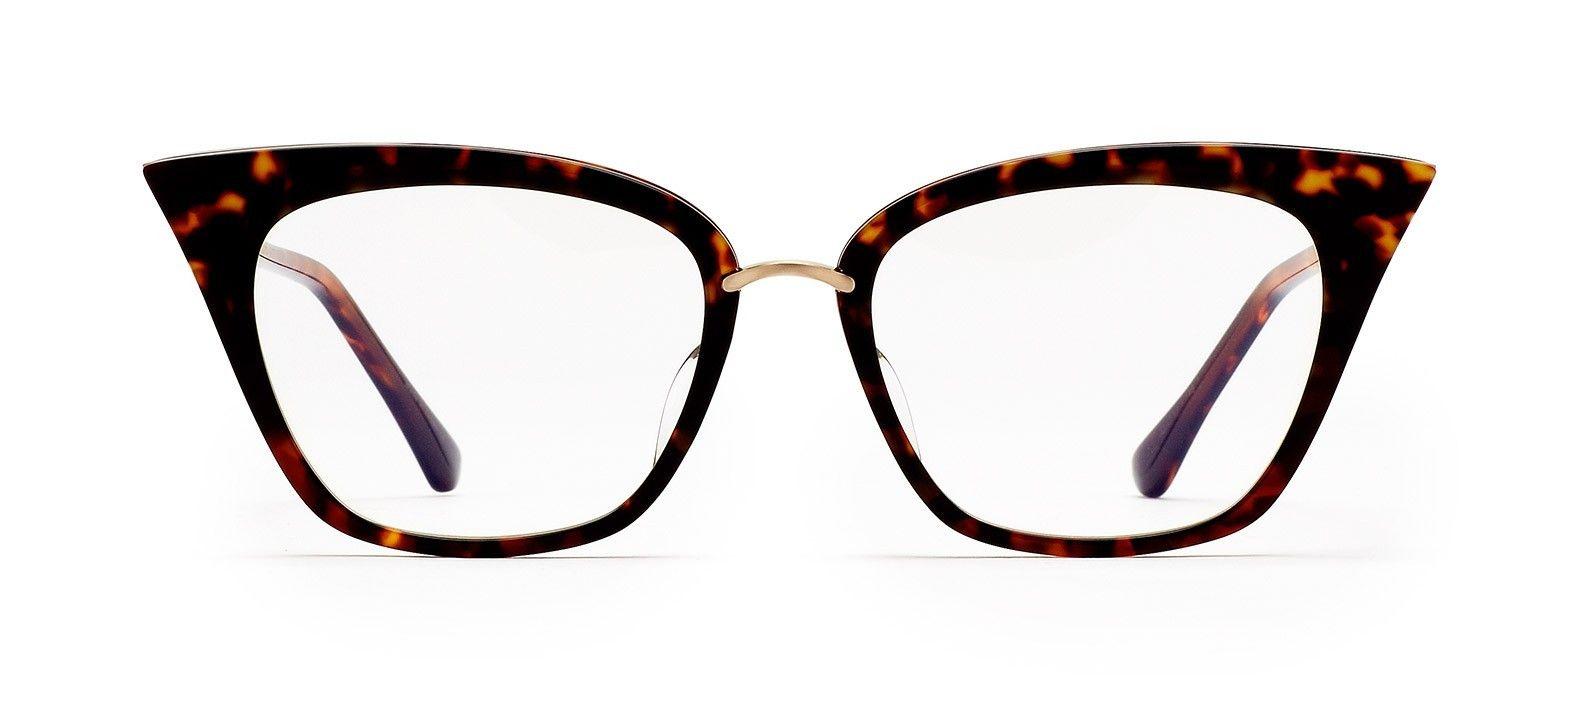 Rebella Cat Eye Sunglasses in Navy or Dark Tortoise | DITA #dita ...